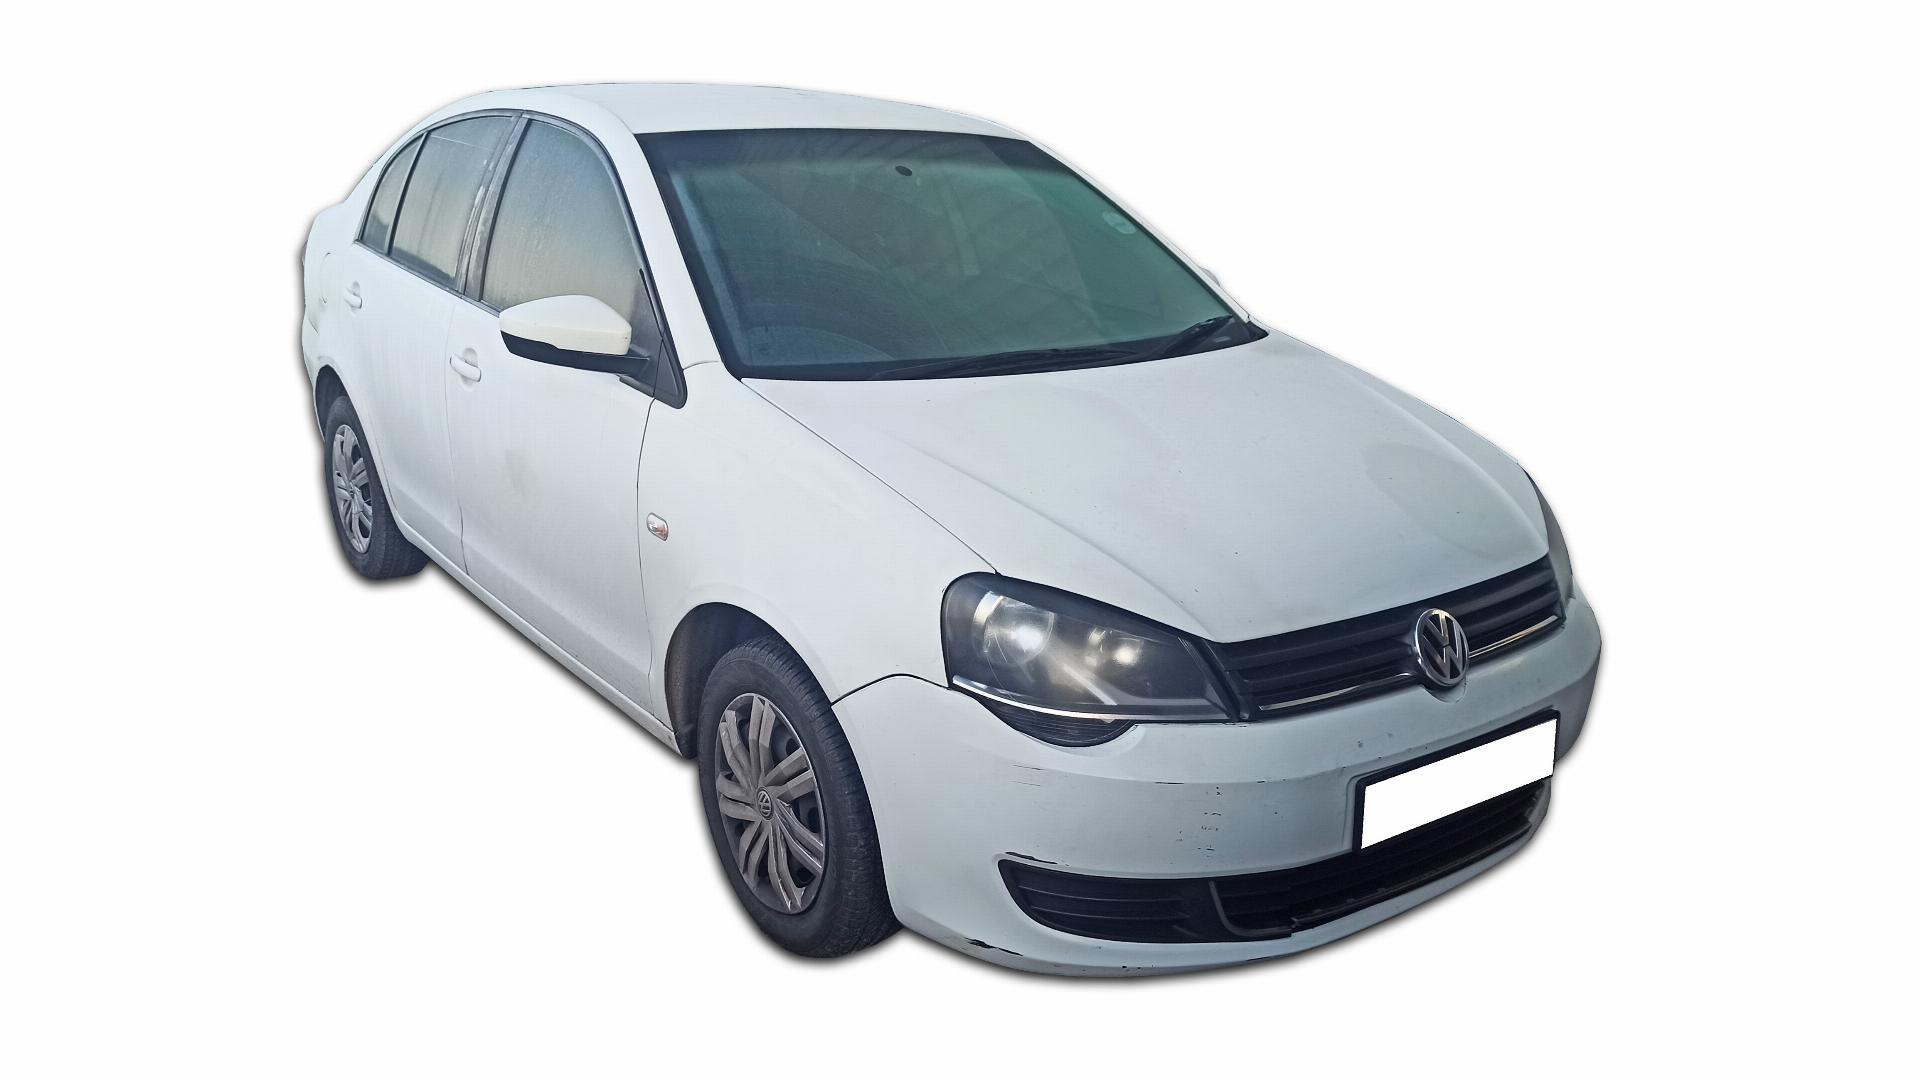 VW Polo GP 1.4 TR